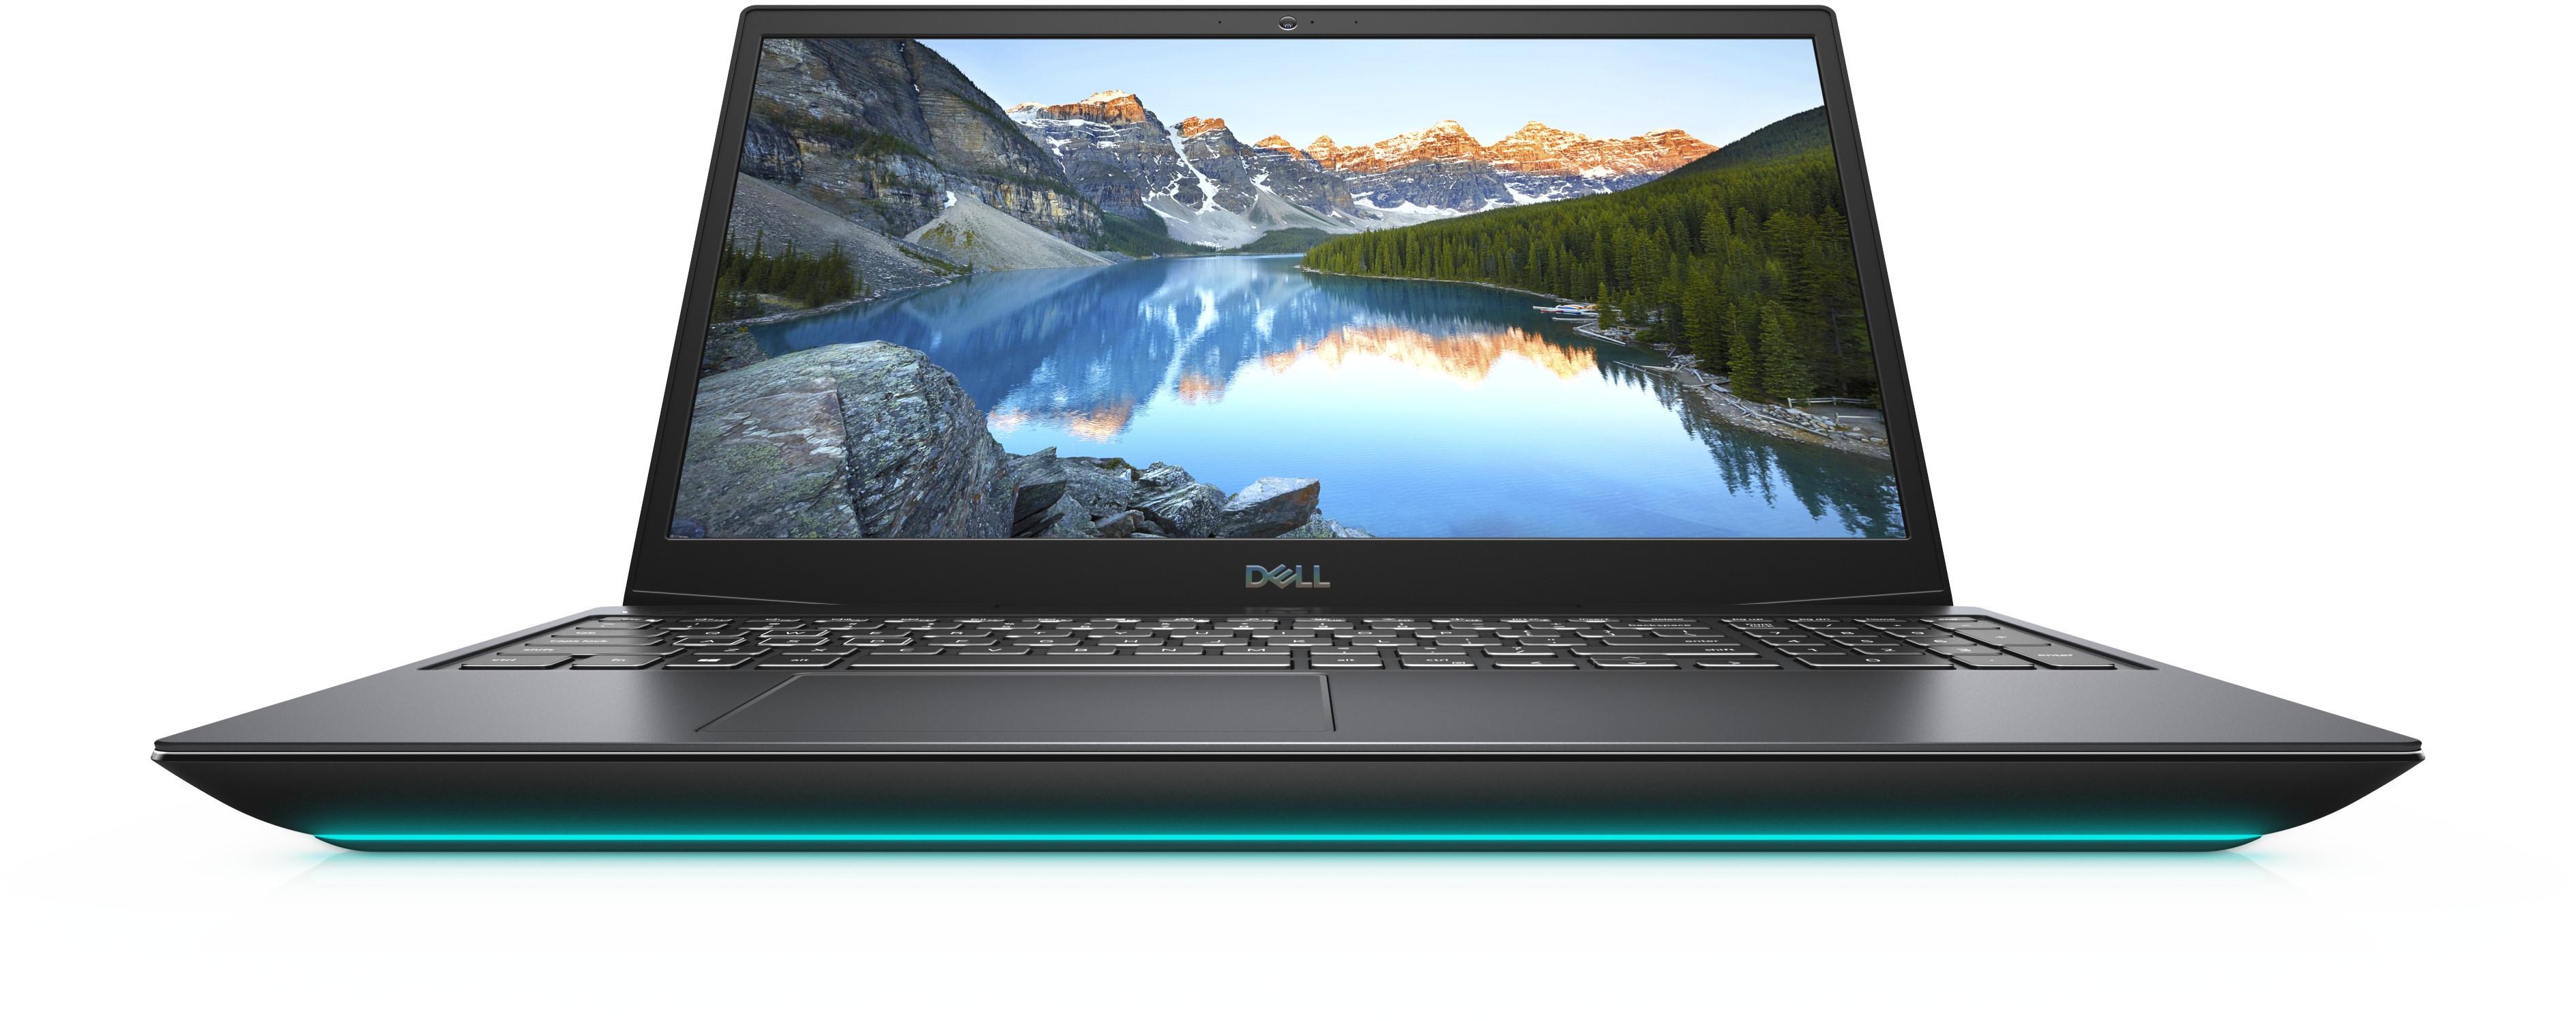 Dell Inspiron G5 5500 (5500-4915)